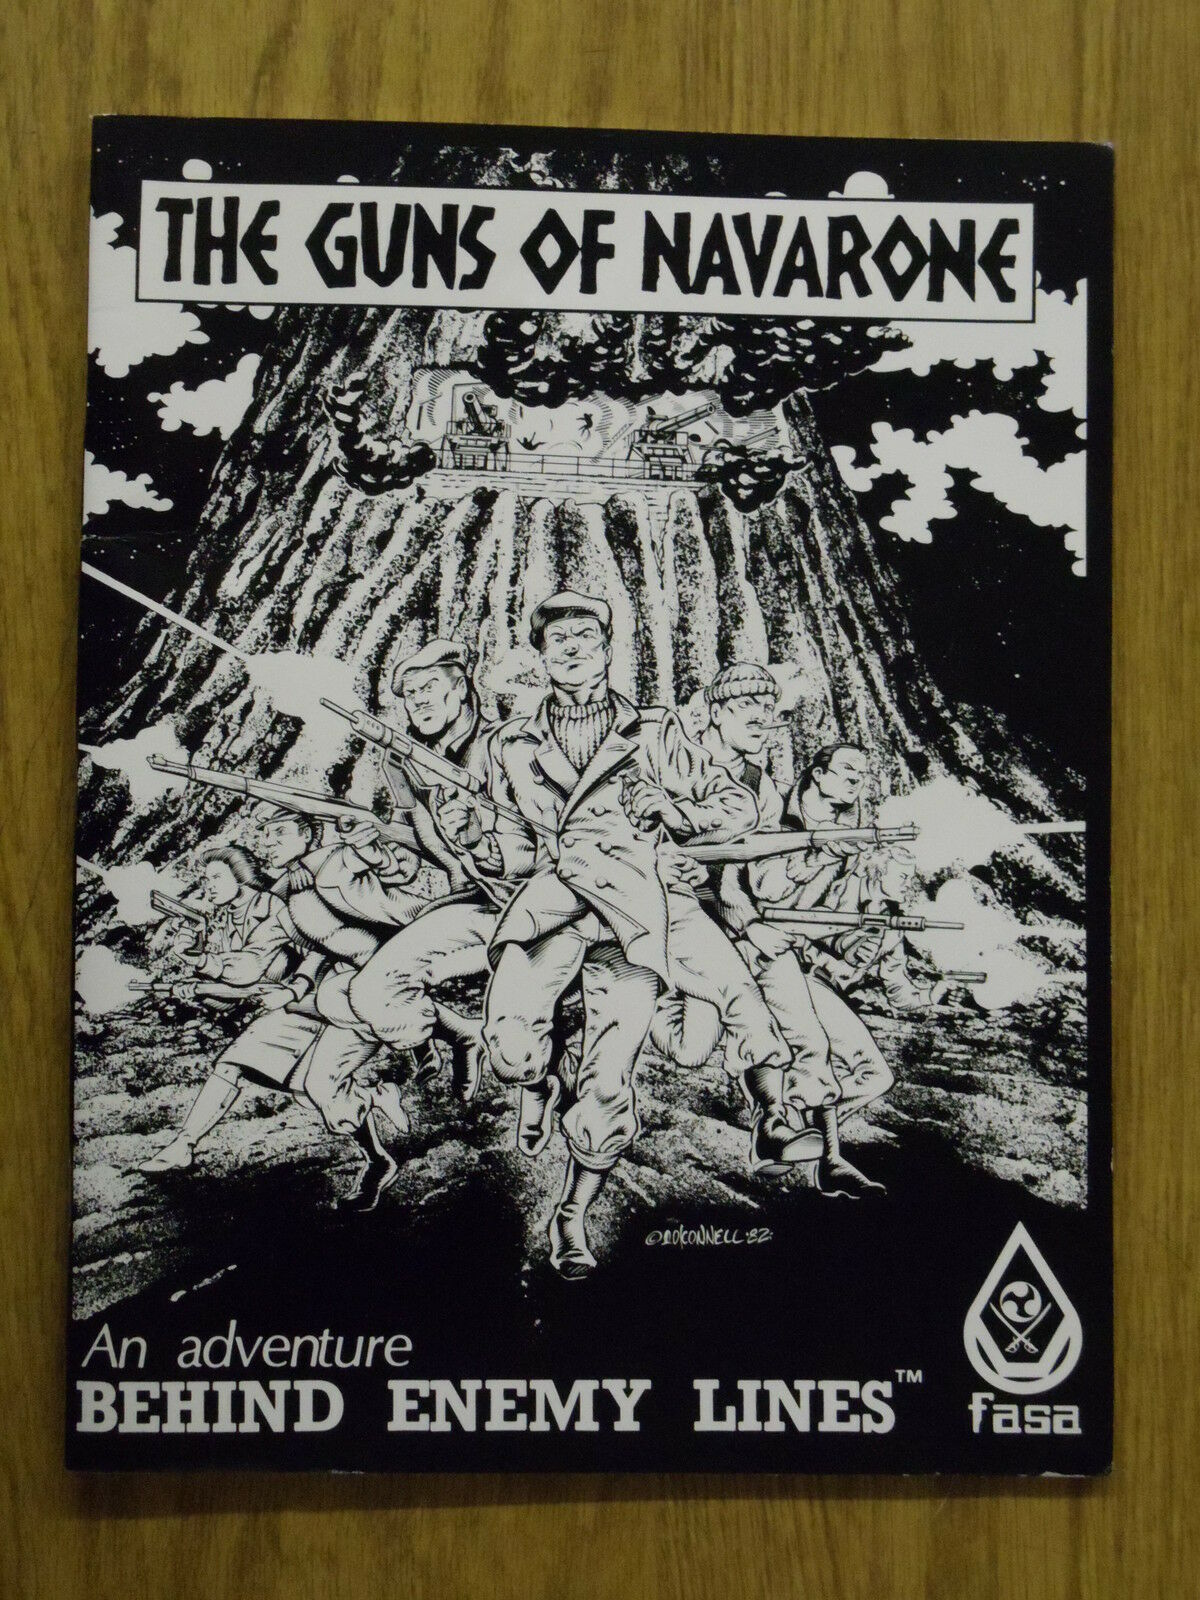 1982 FASA Guns of Navarone RPG Module